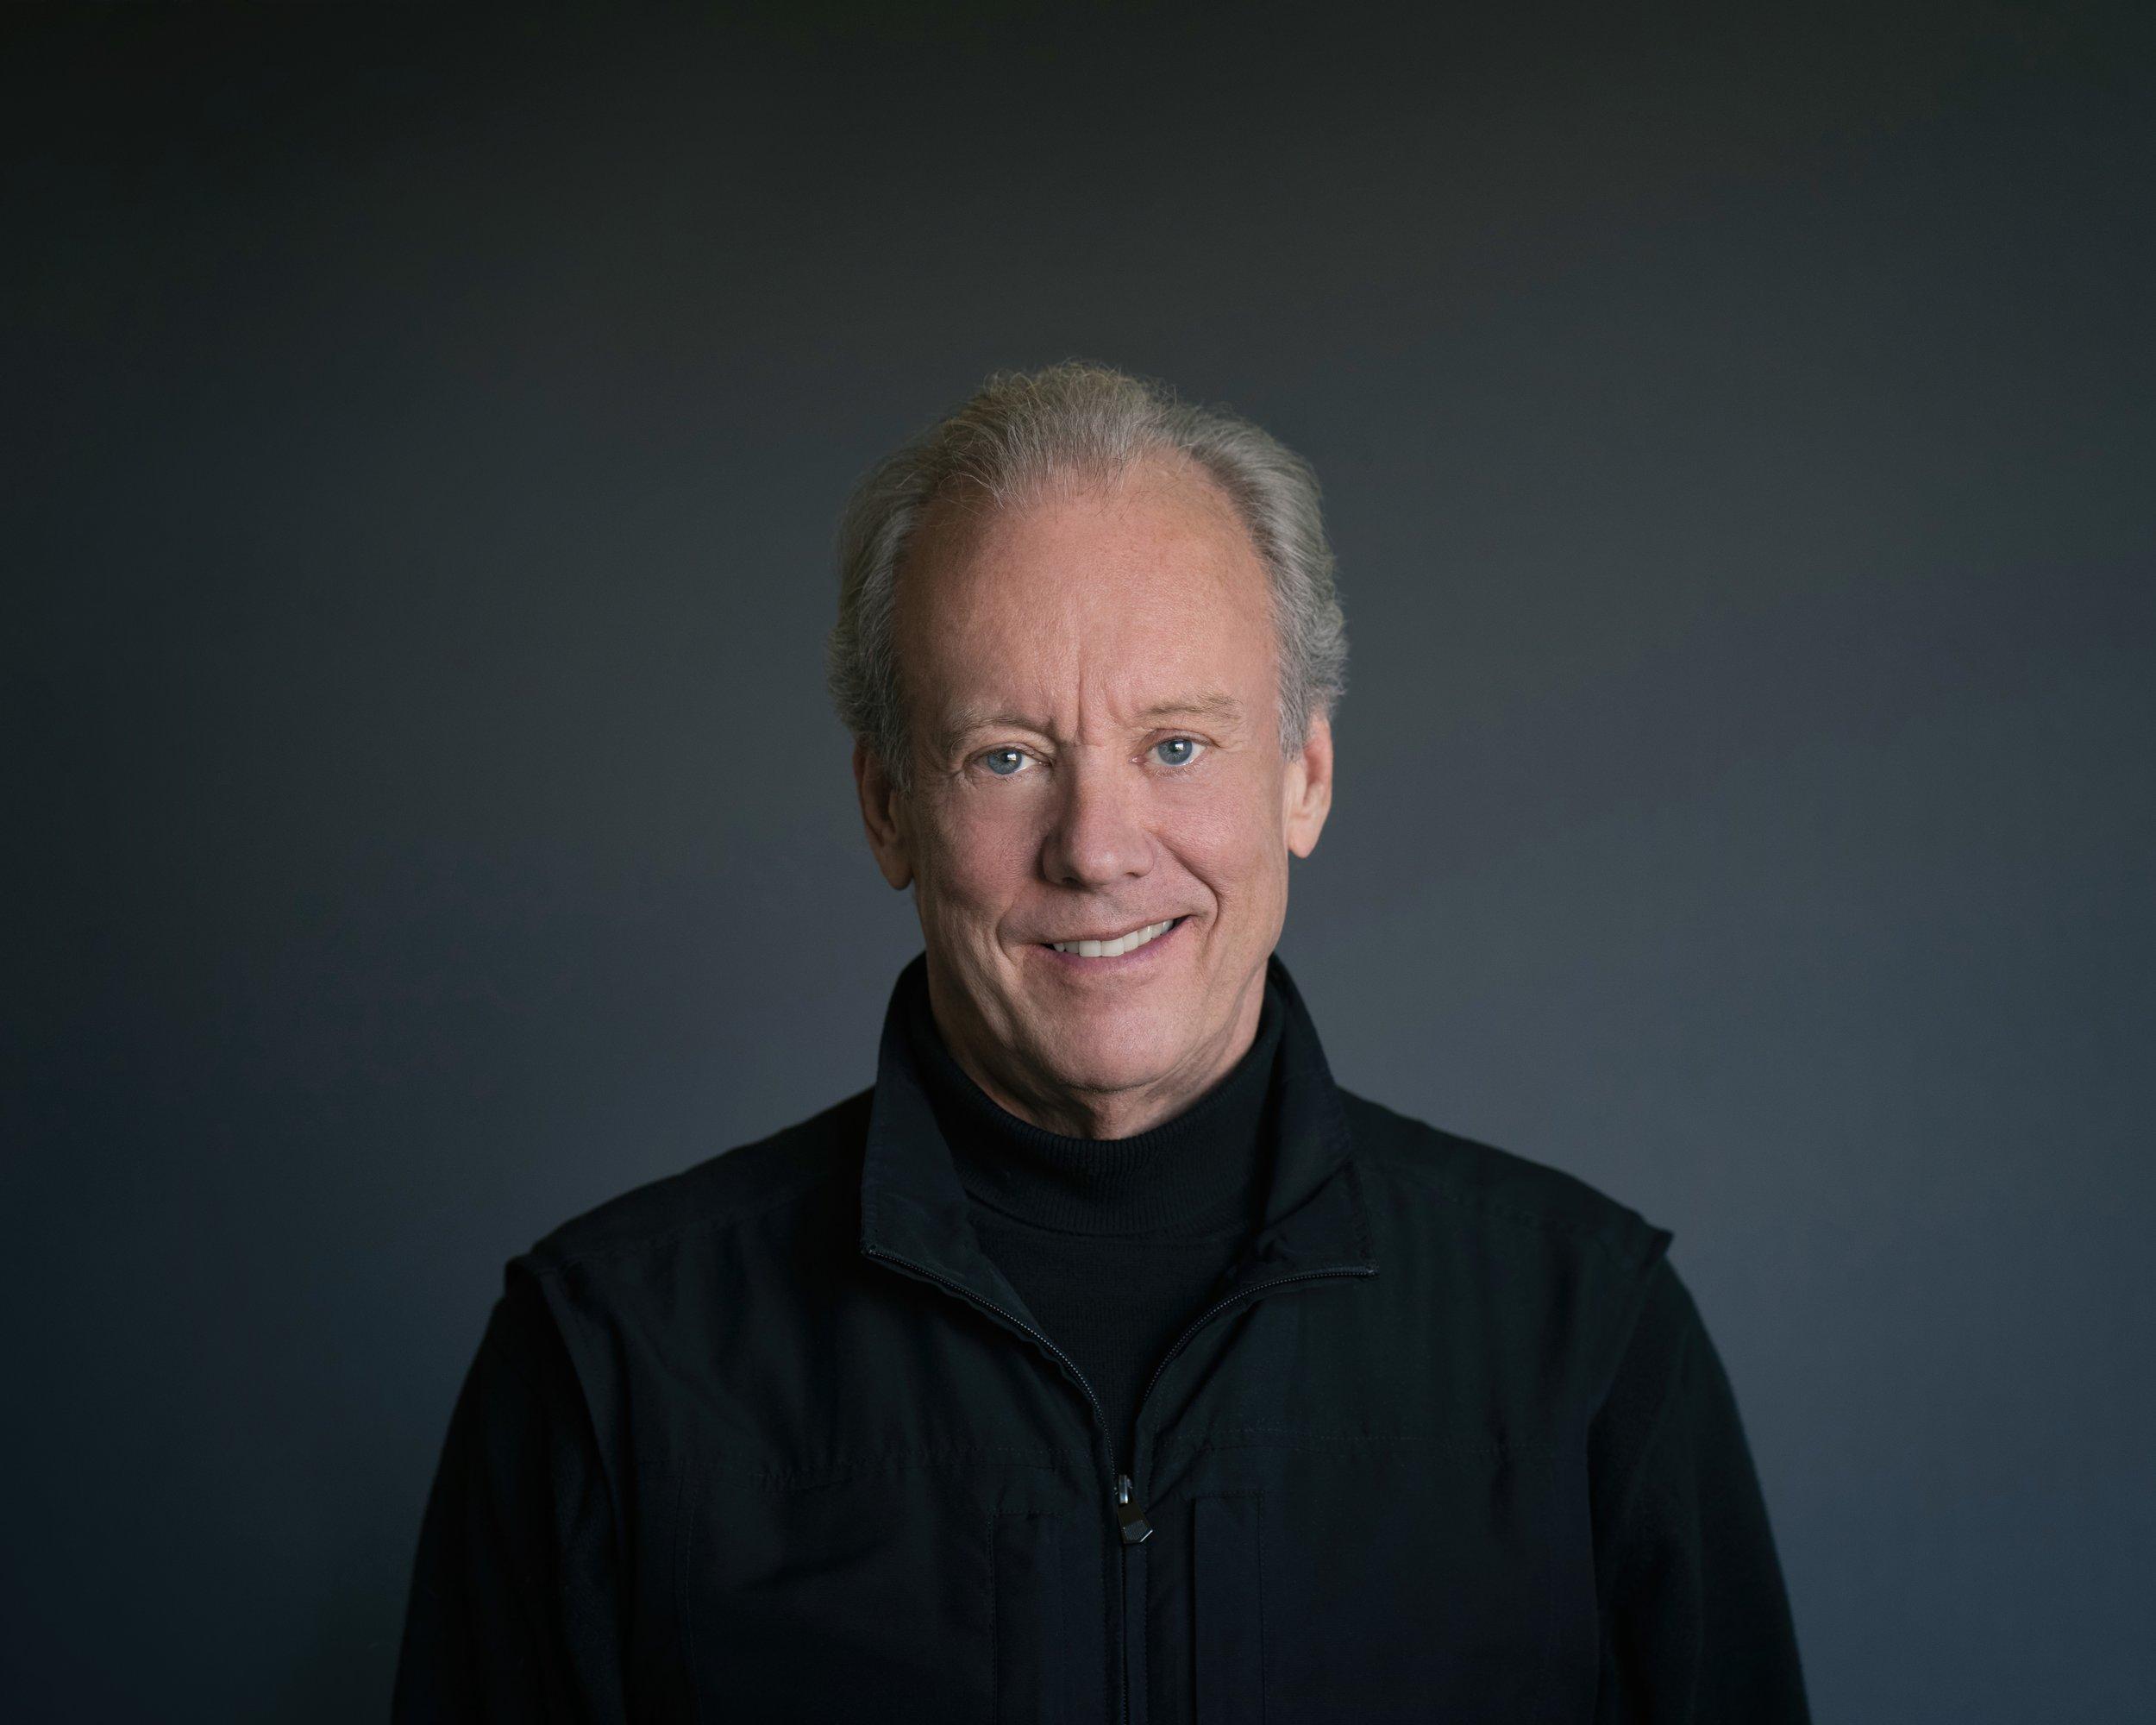 William McDonough - Father of the Circular Economy and Cradle-to-Cradle Design